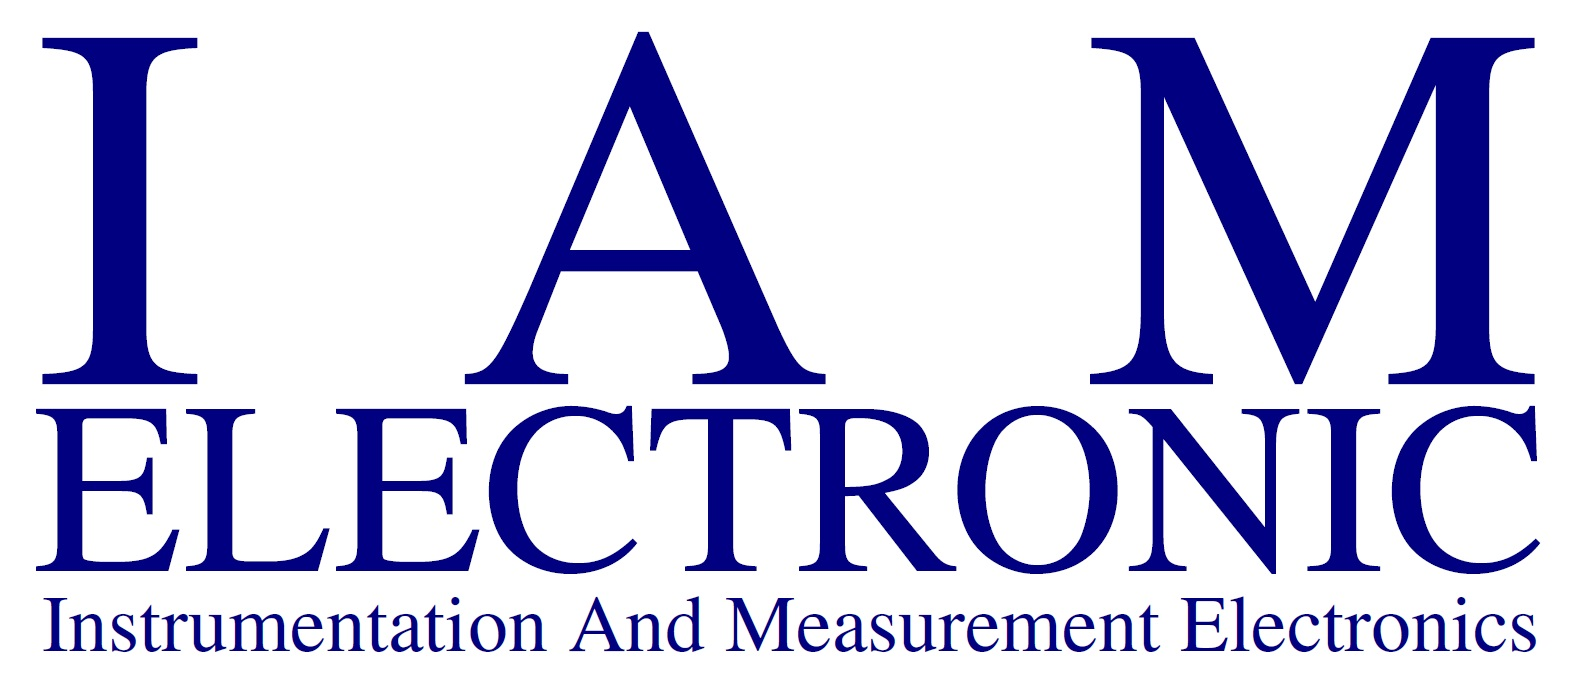 hight resolution of iam electronic instrumentation and measurement electronics artix 7 fpga module